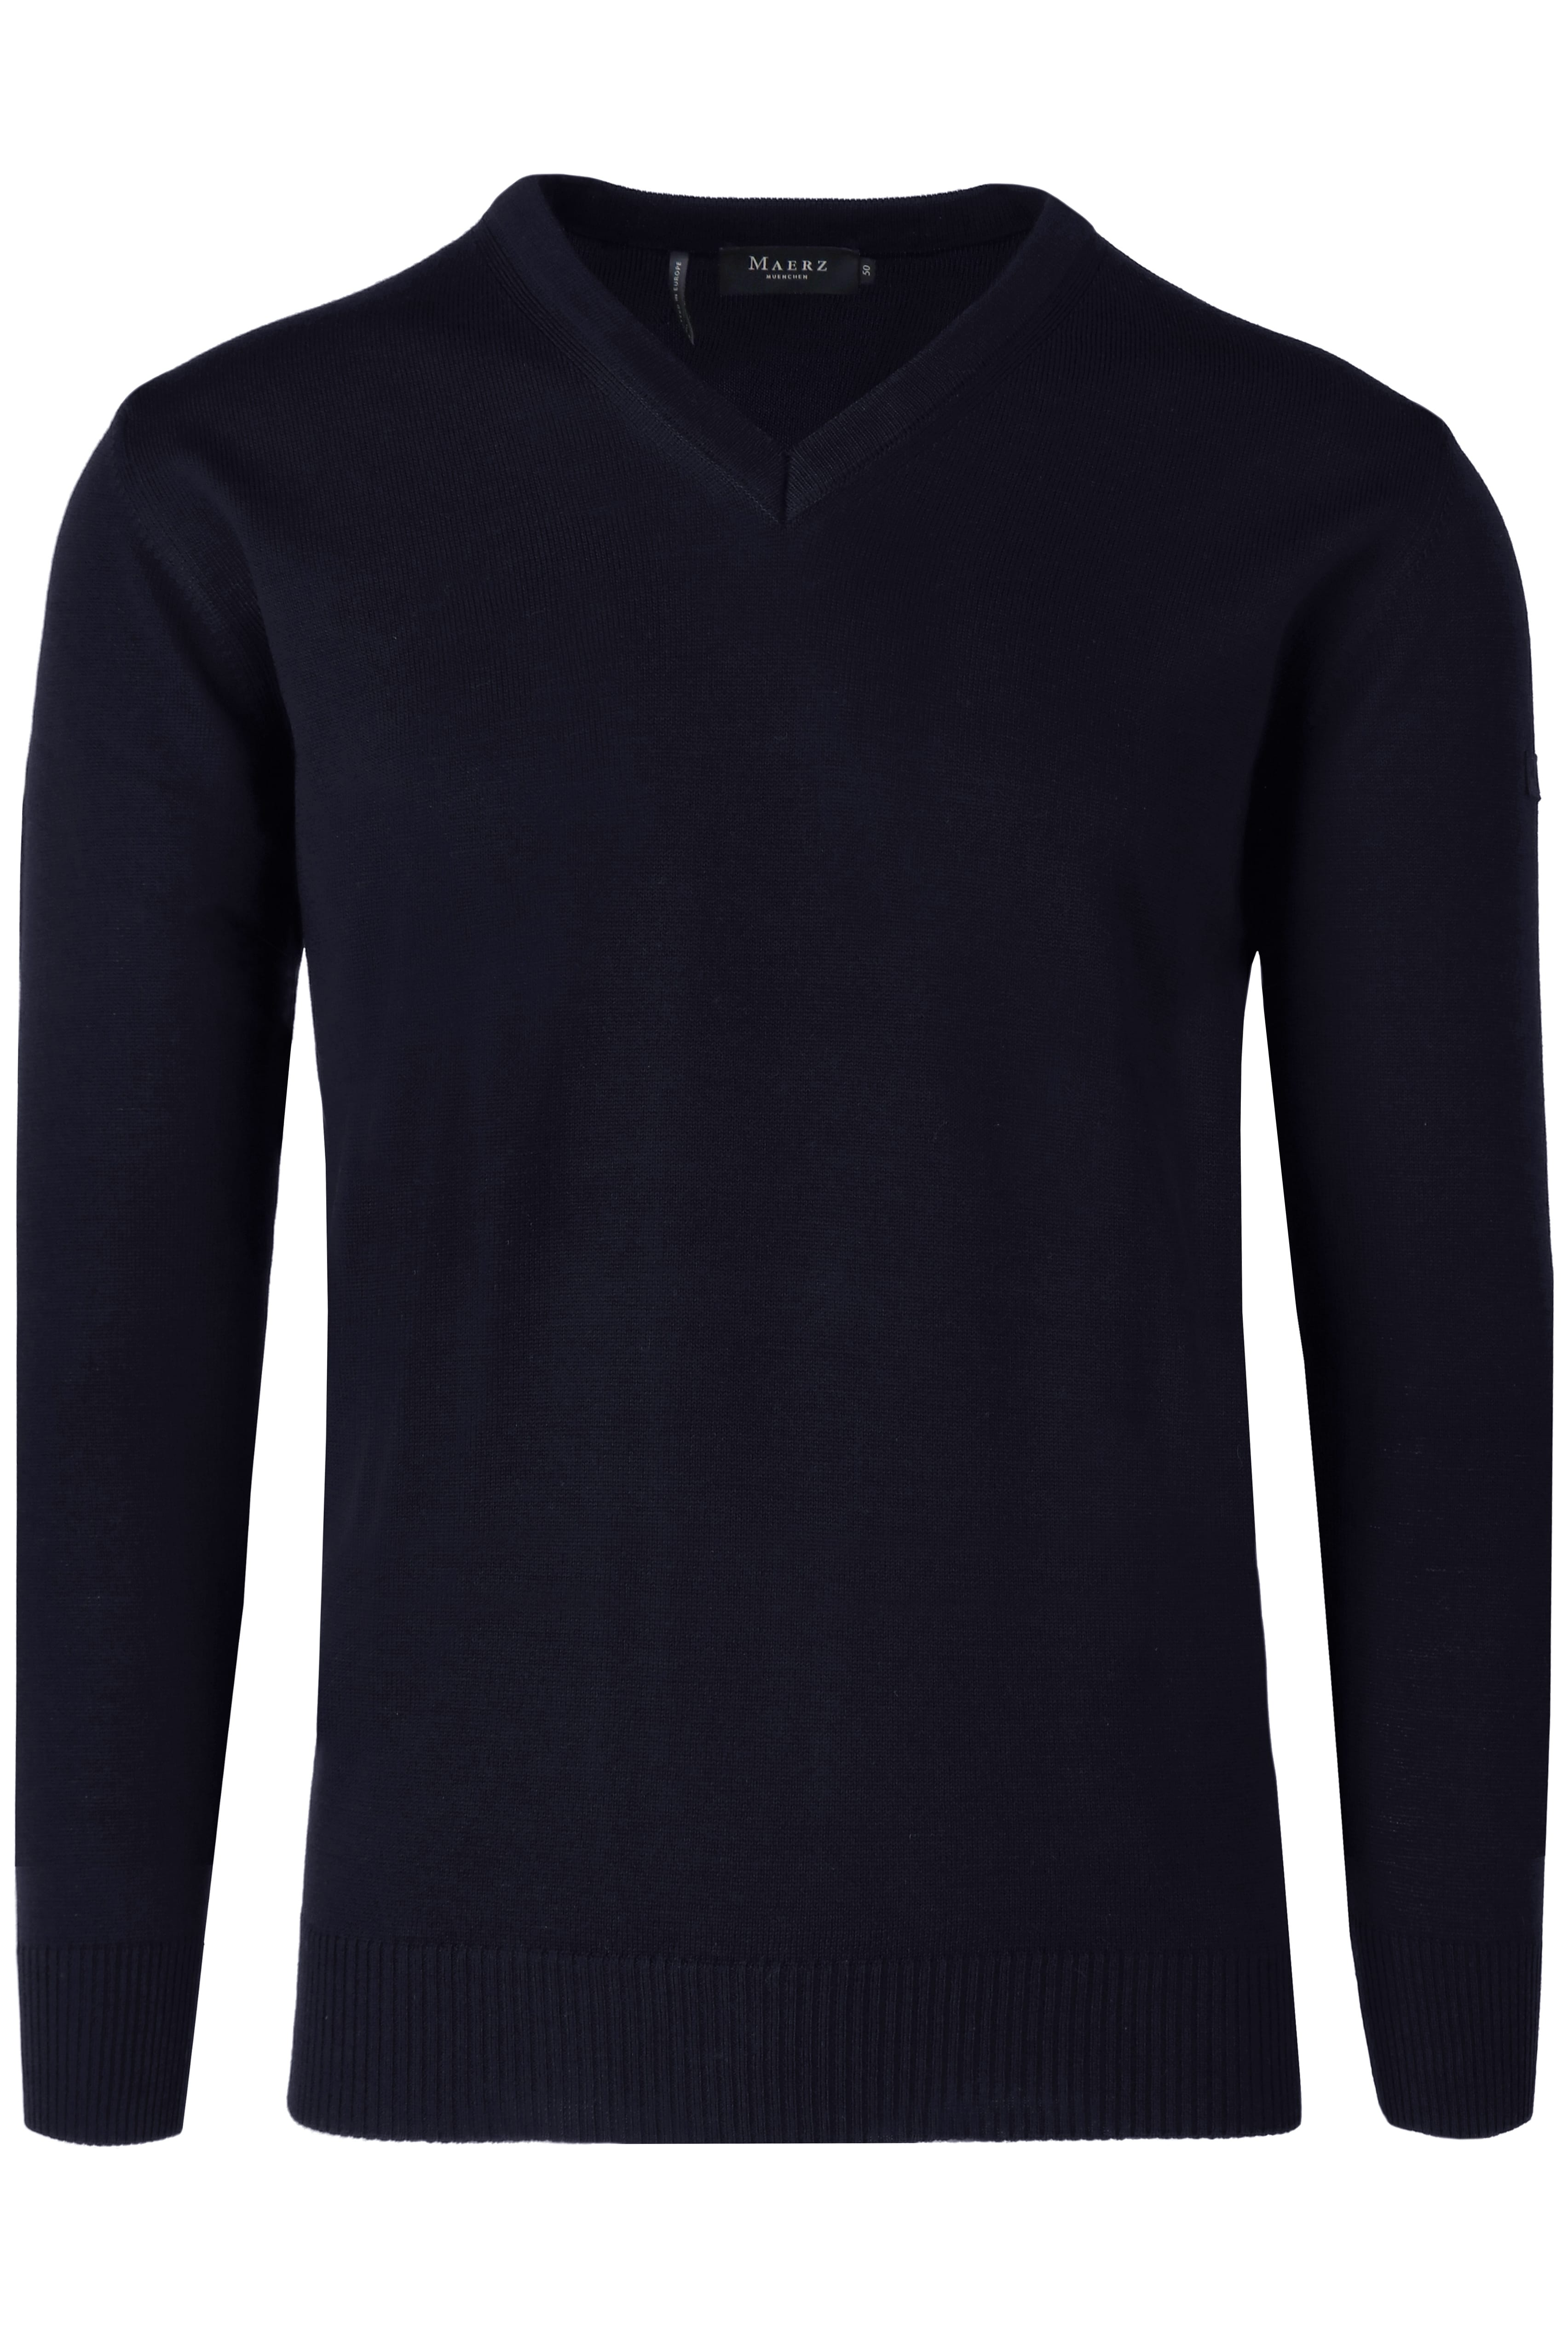 MAERZ Classic Fit Pullover V-Ausschnitt navy, einfarbig 56